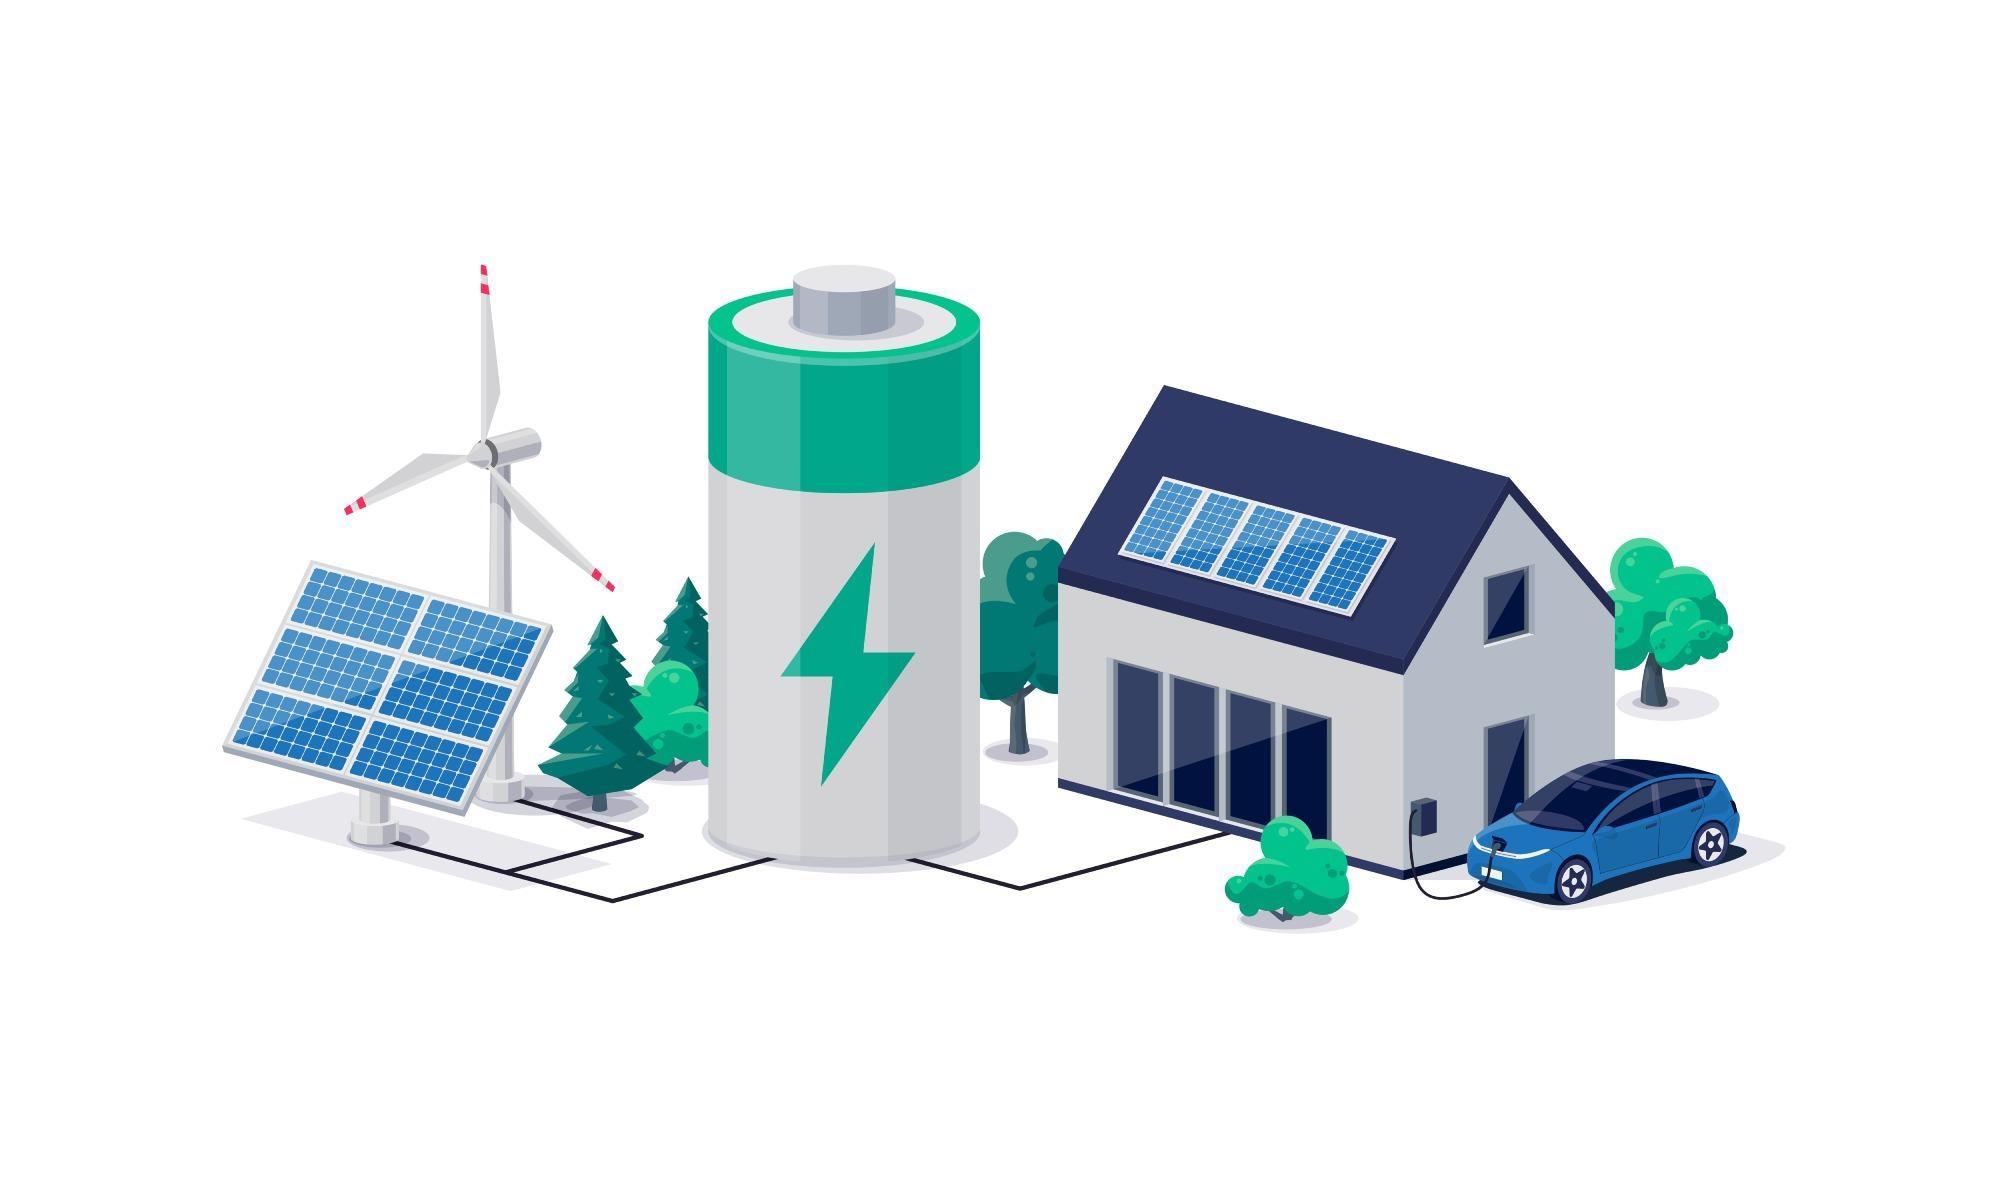 Exponential Power Acquires Dry Creek Enterprises